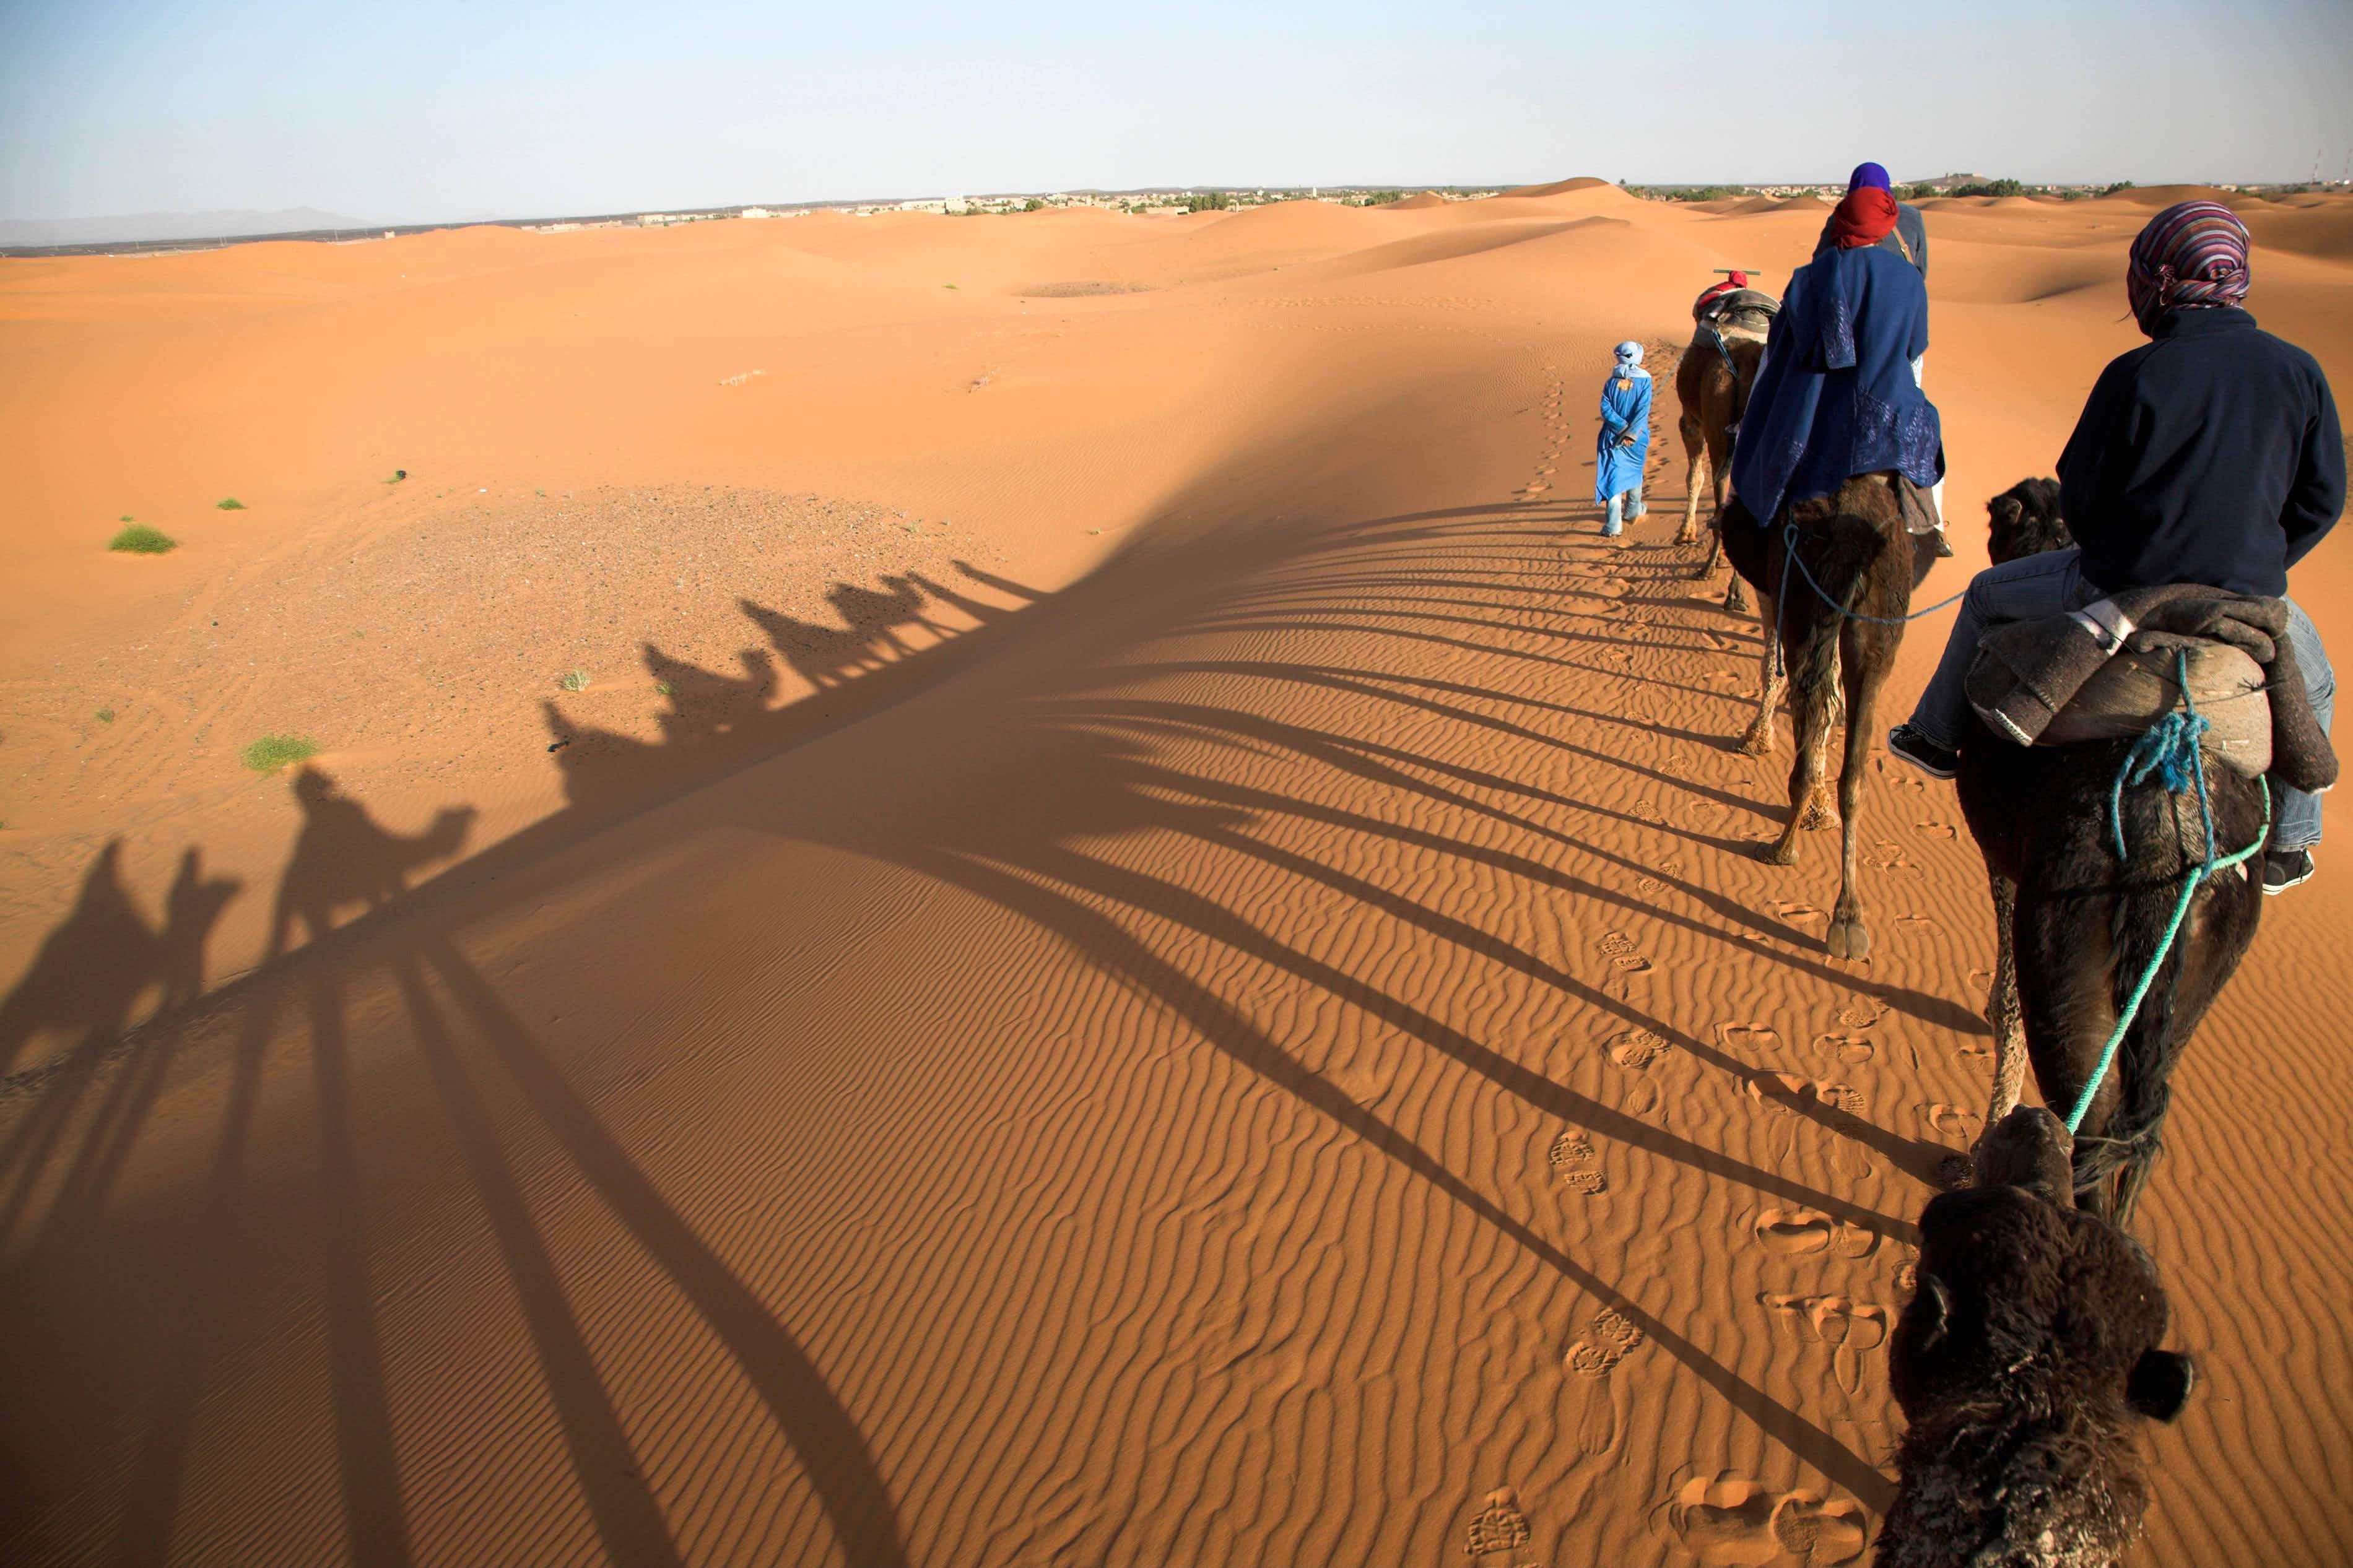 Portuguese filmmaker captures mesmerising drone footage of Morocco's unique landscape